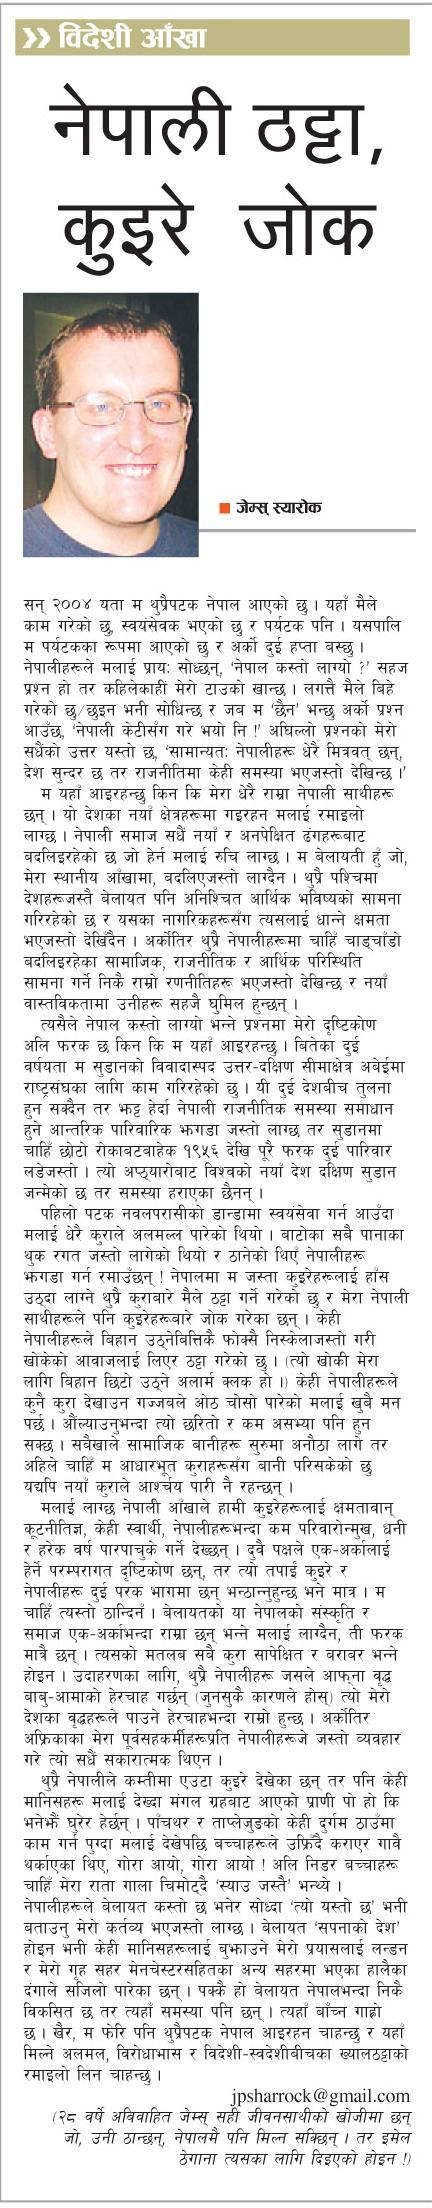 James Sharrock Kantipur article in Nepali